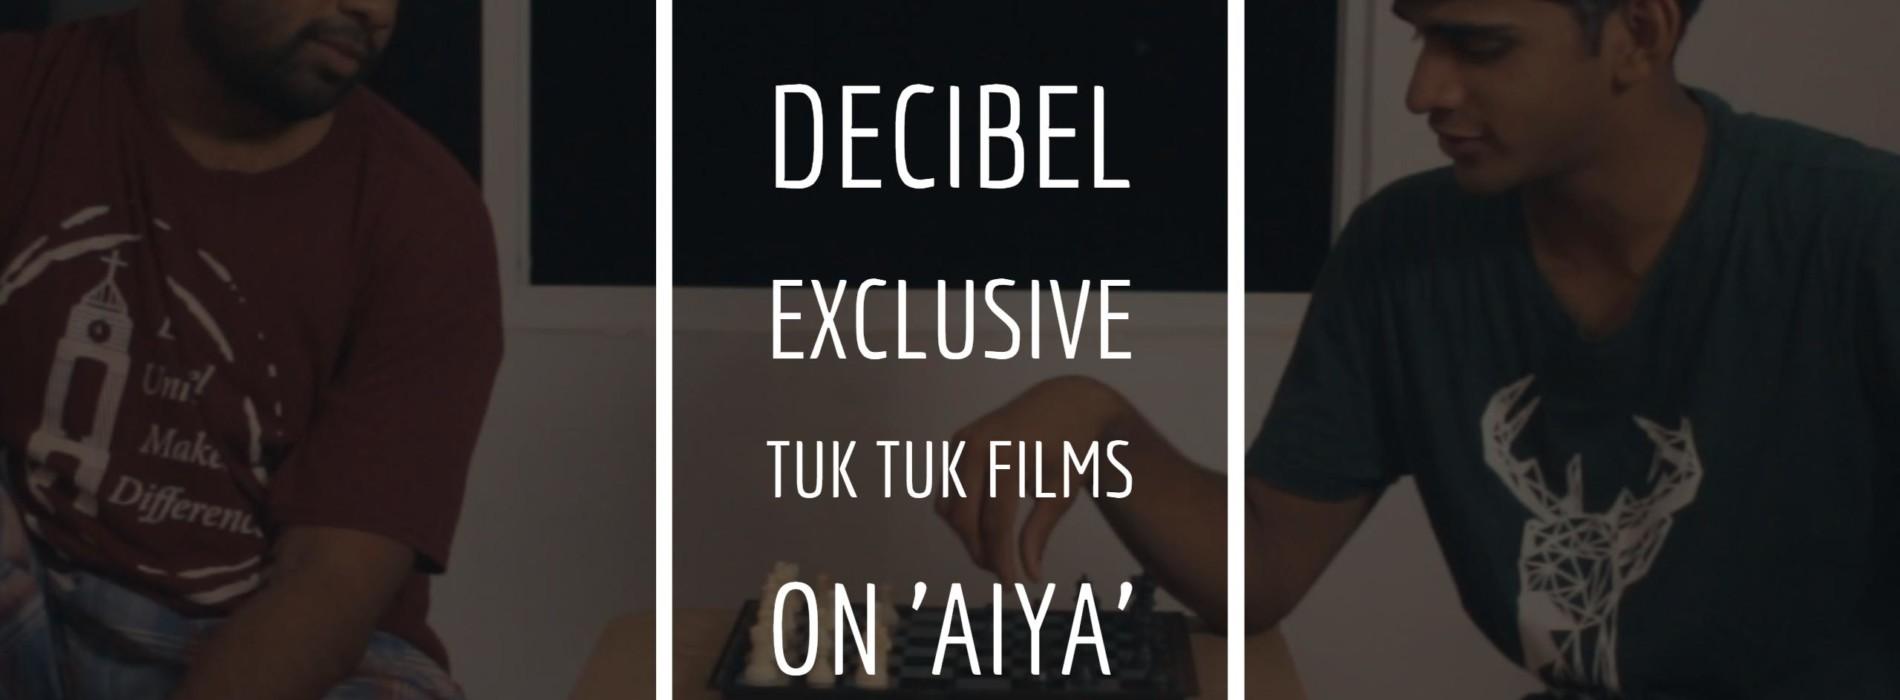 Decibel Exclusive : Aiya (the short movie)